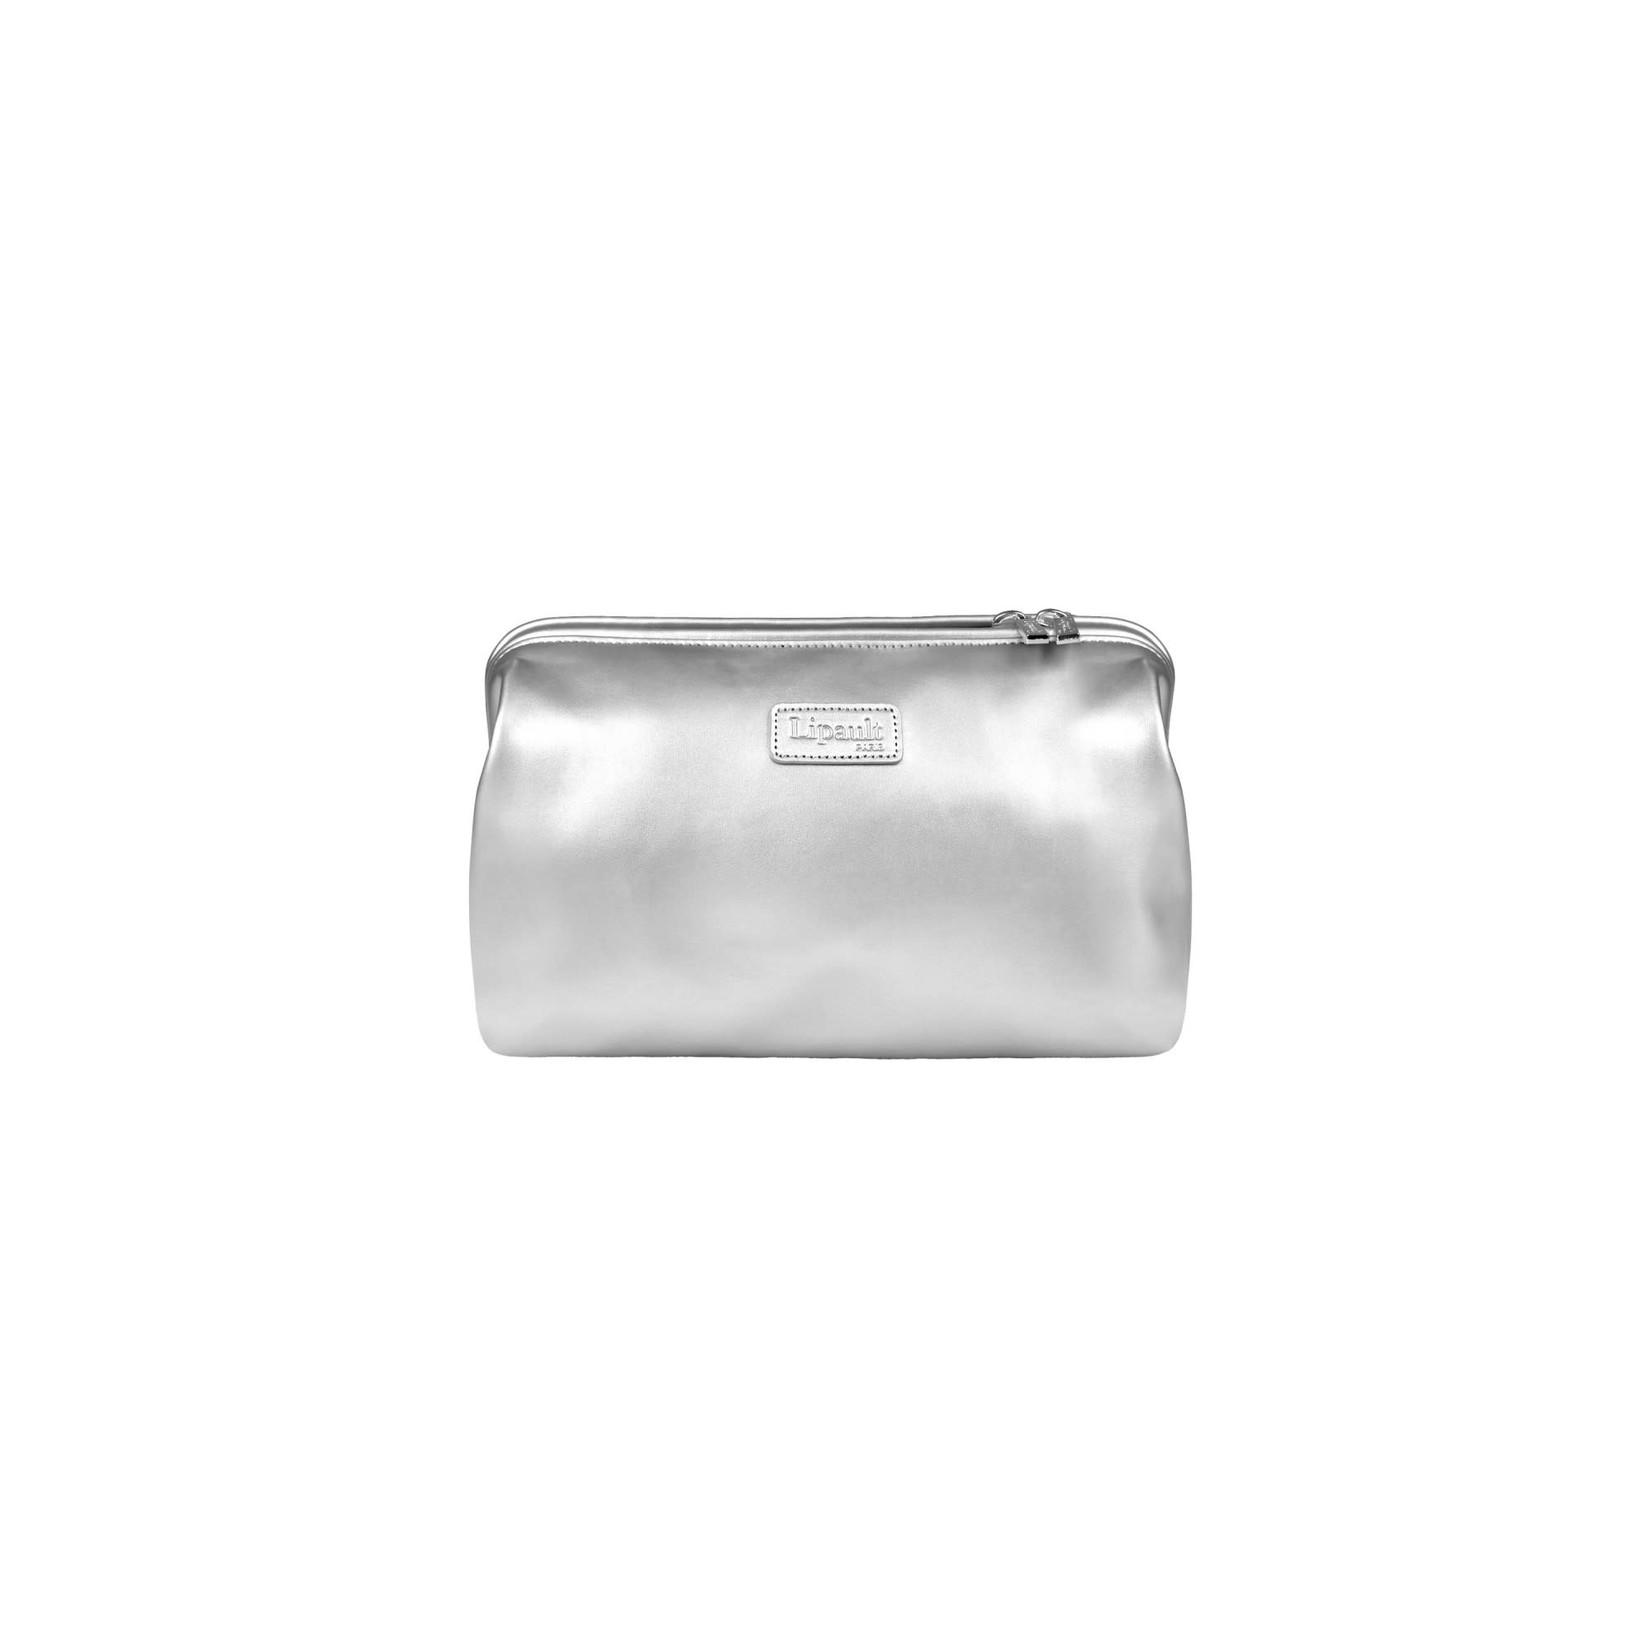 PLUME TOILETRY KIT Silver